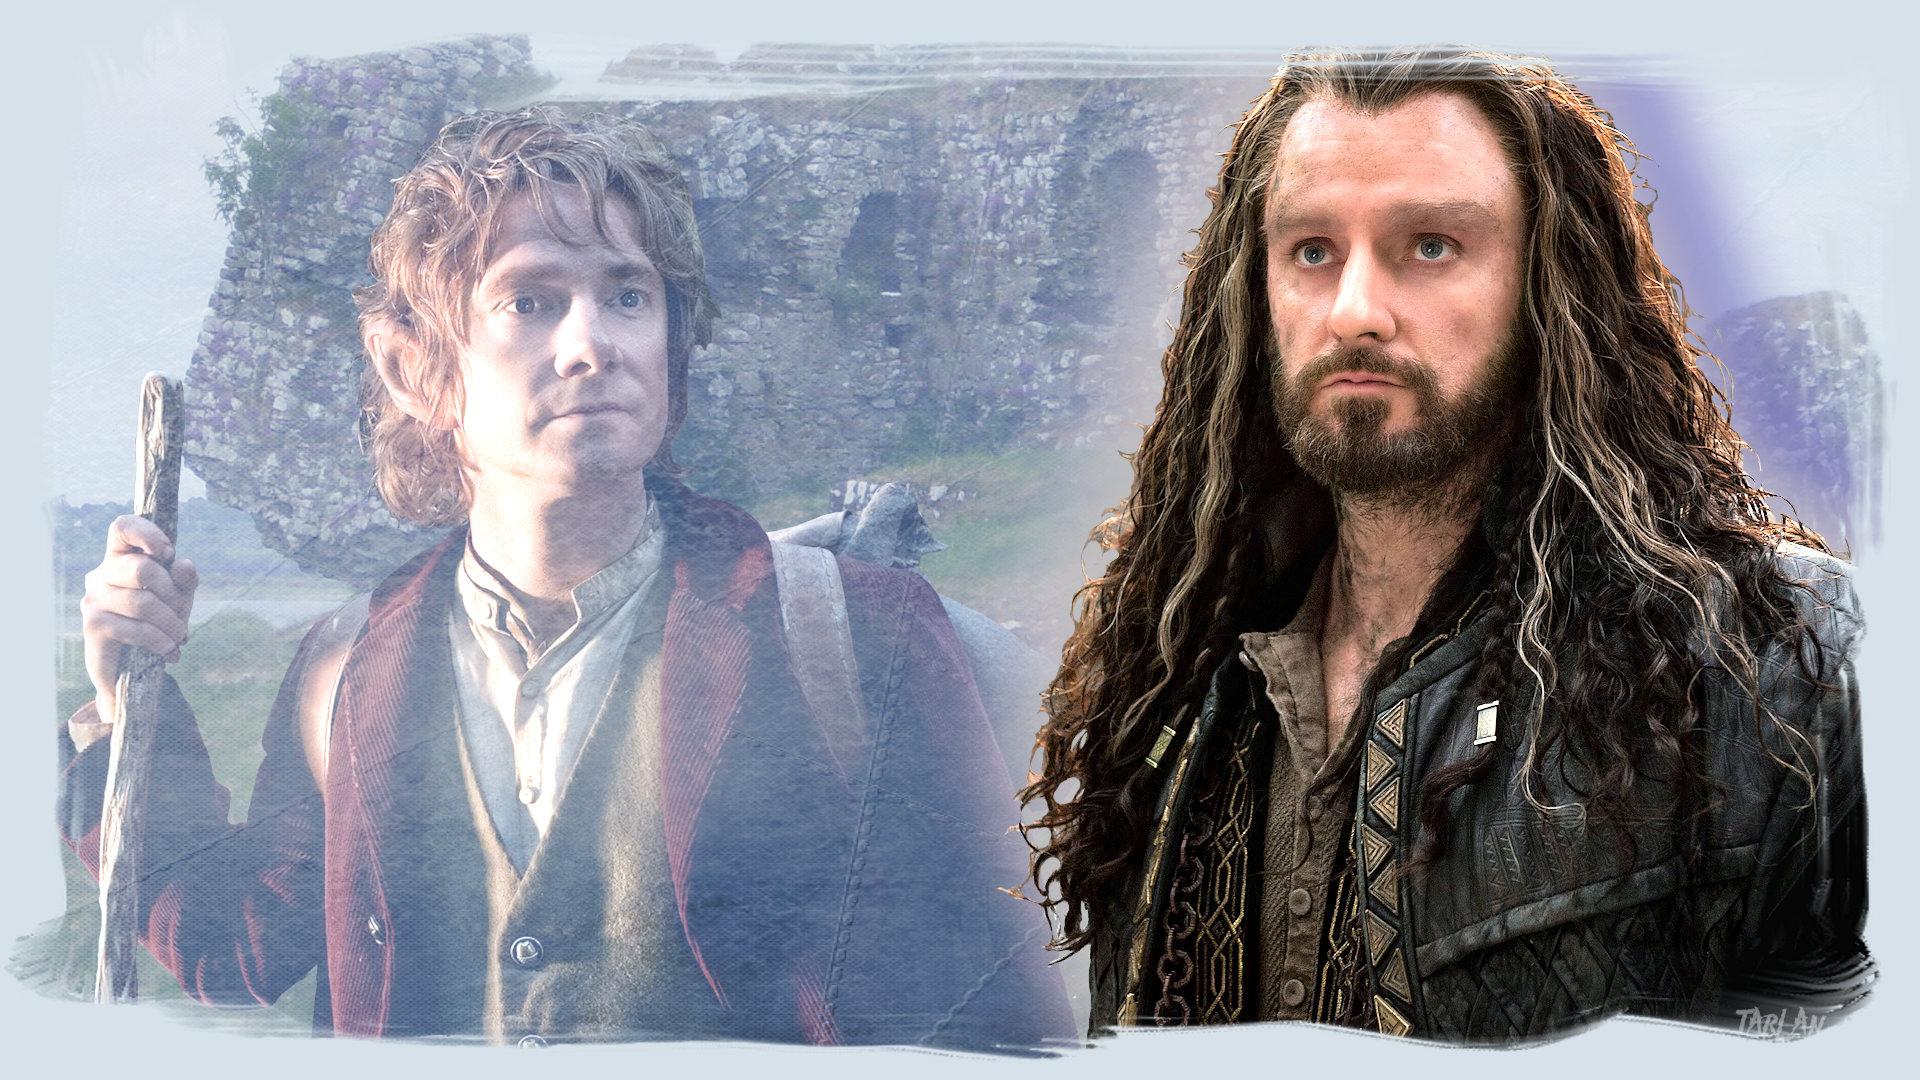 The Hobbit - Thorin and Bilbo by Tarlan